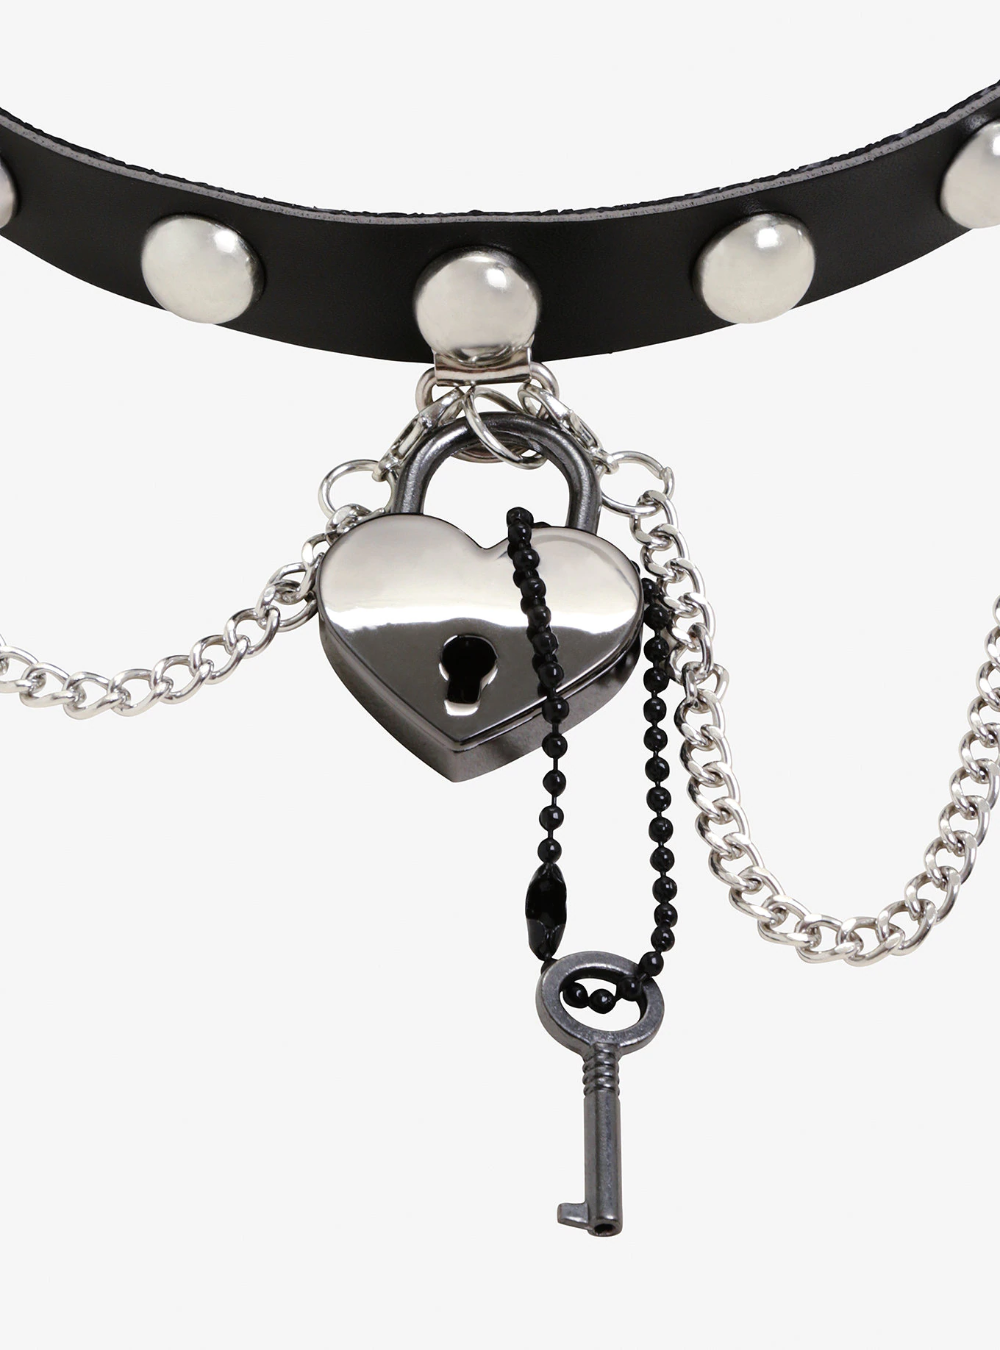 Choker Necklace Punk Collar Gothic Chain Rivet Women Spike Buckle Pendant Glossy